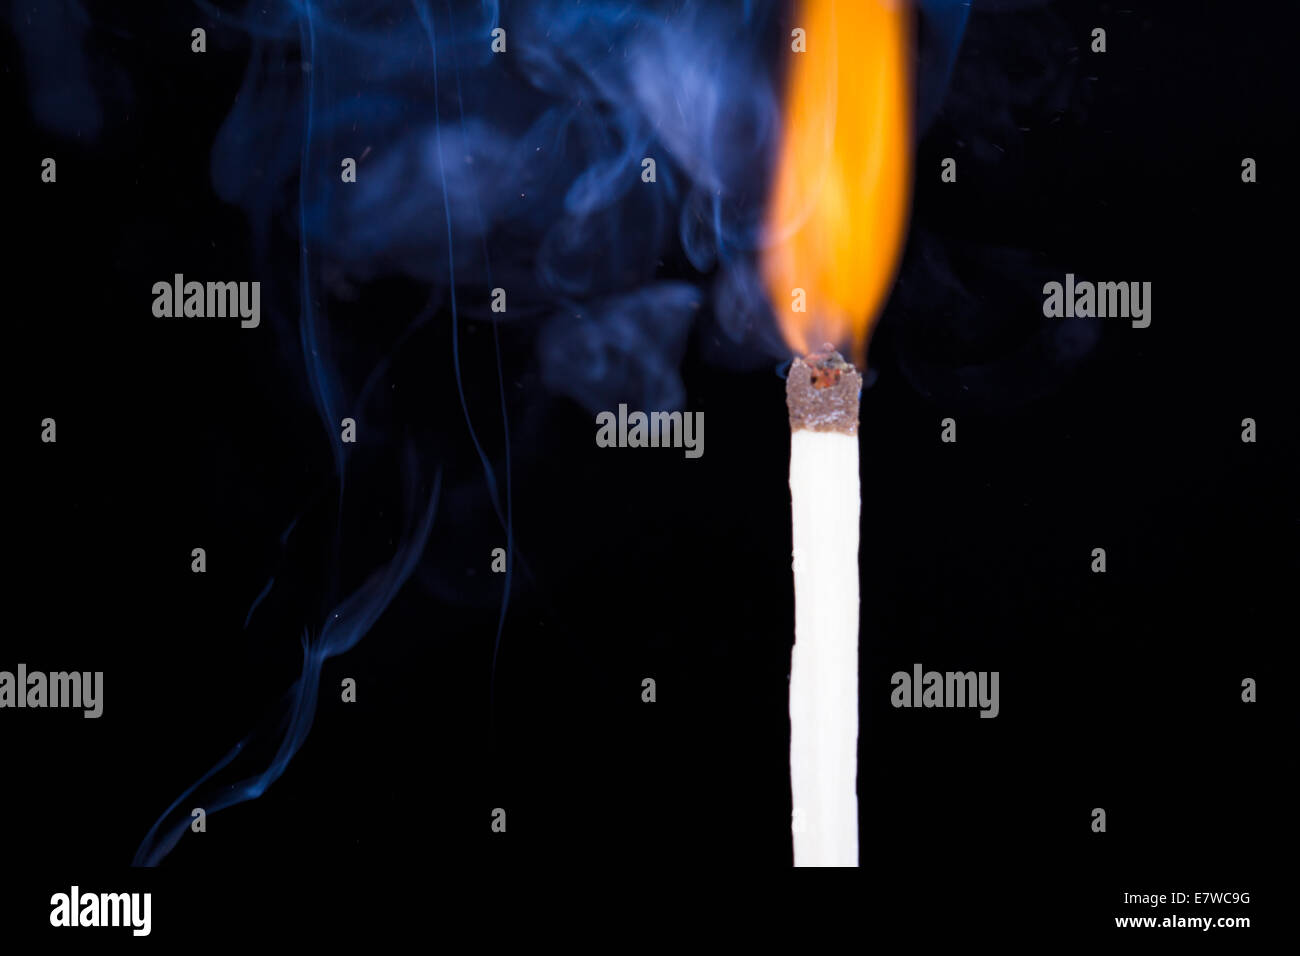 Burning match flame and smoke on dark background. - Stock Image